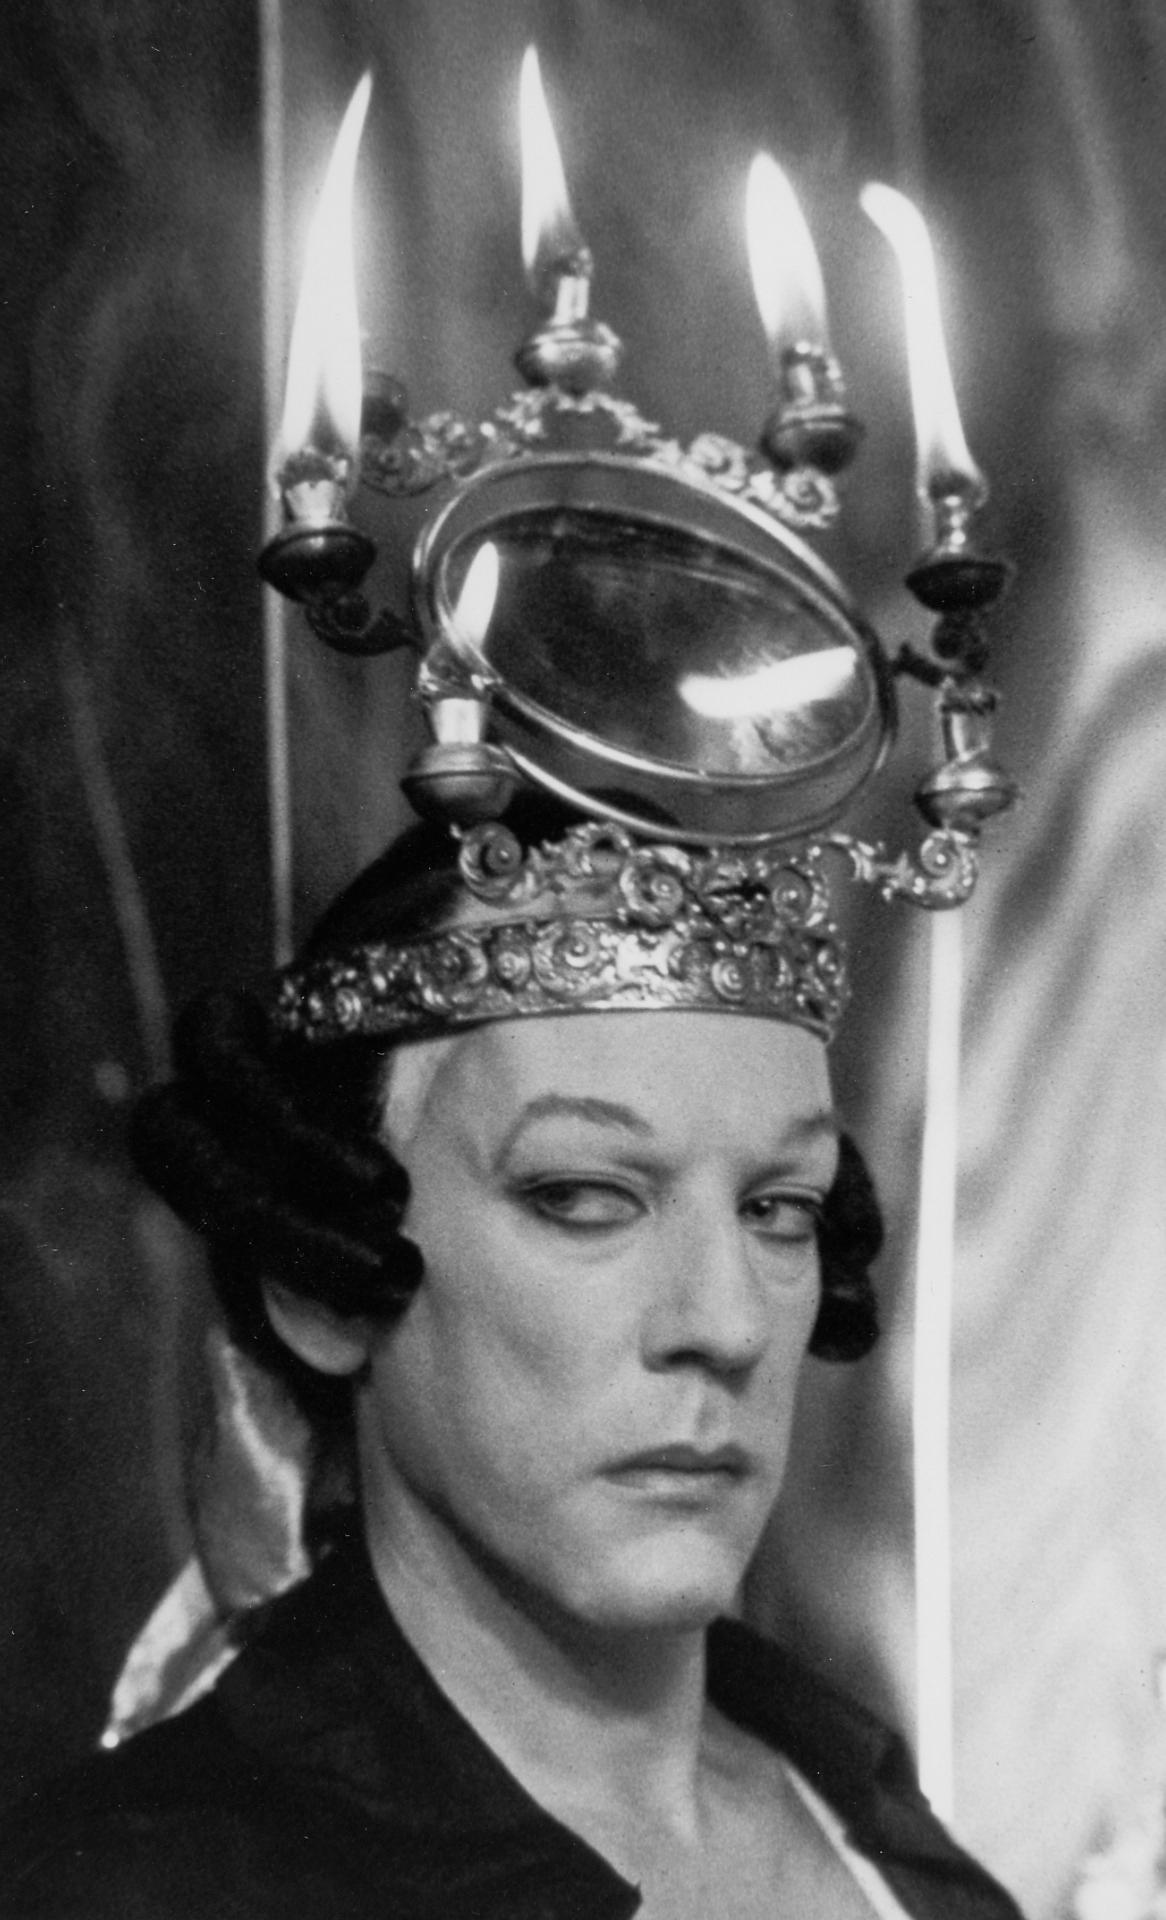 Donald Sutherland, Casanova, 19 - arthurboehm | ello